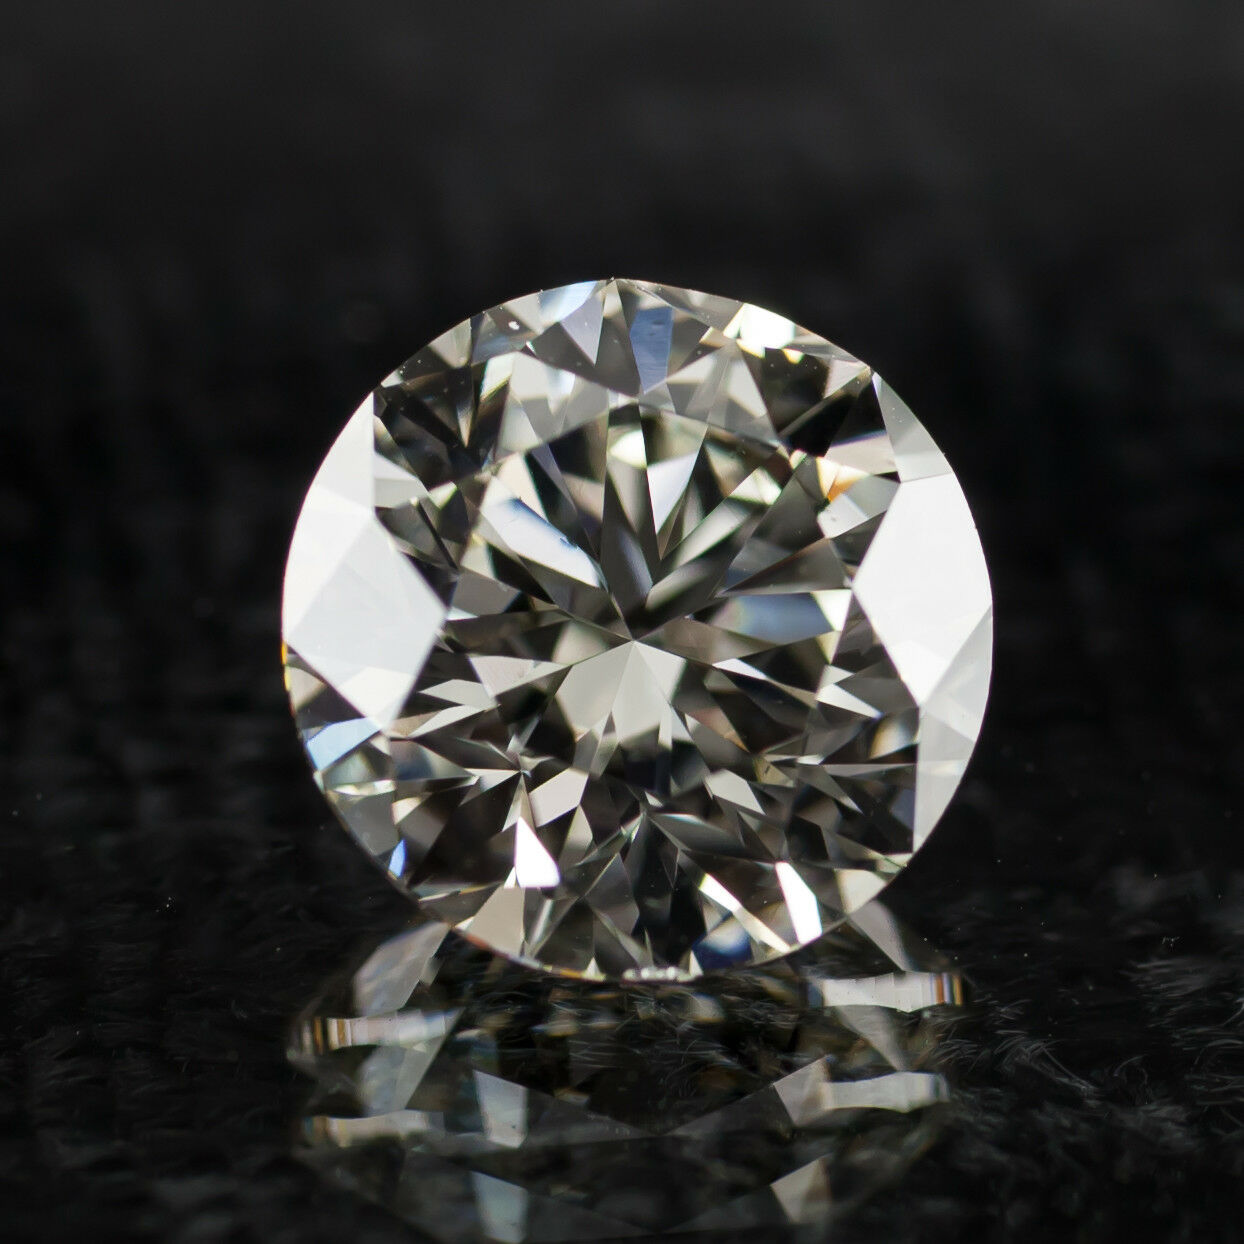 3.02 Carat Loose L  / VS2 Round Brilliant Cut Diamond GIA Certified